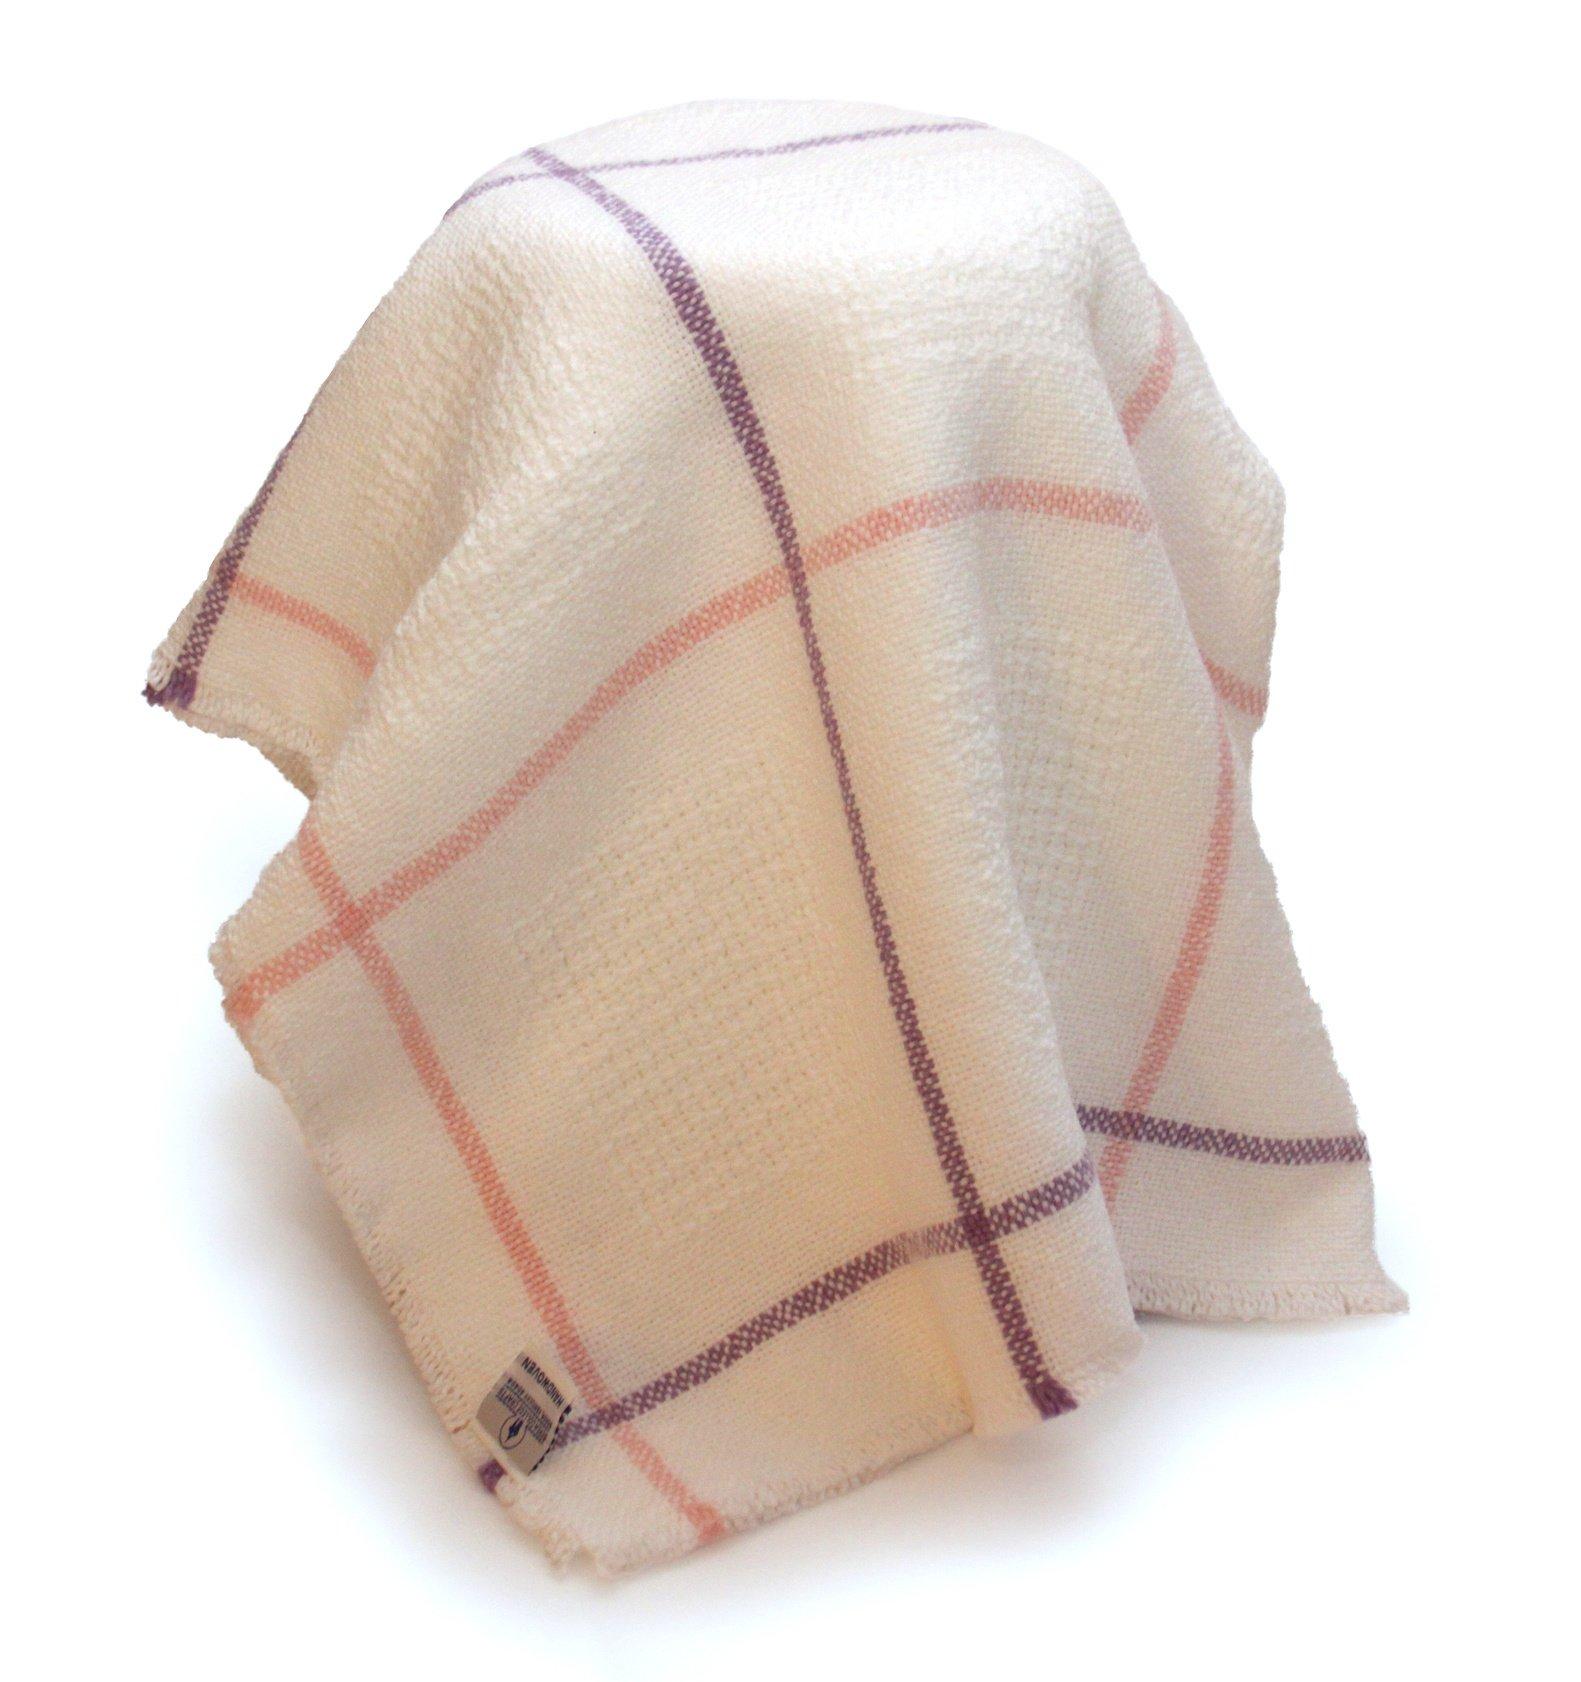 Grid Block Baby Blankets-1